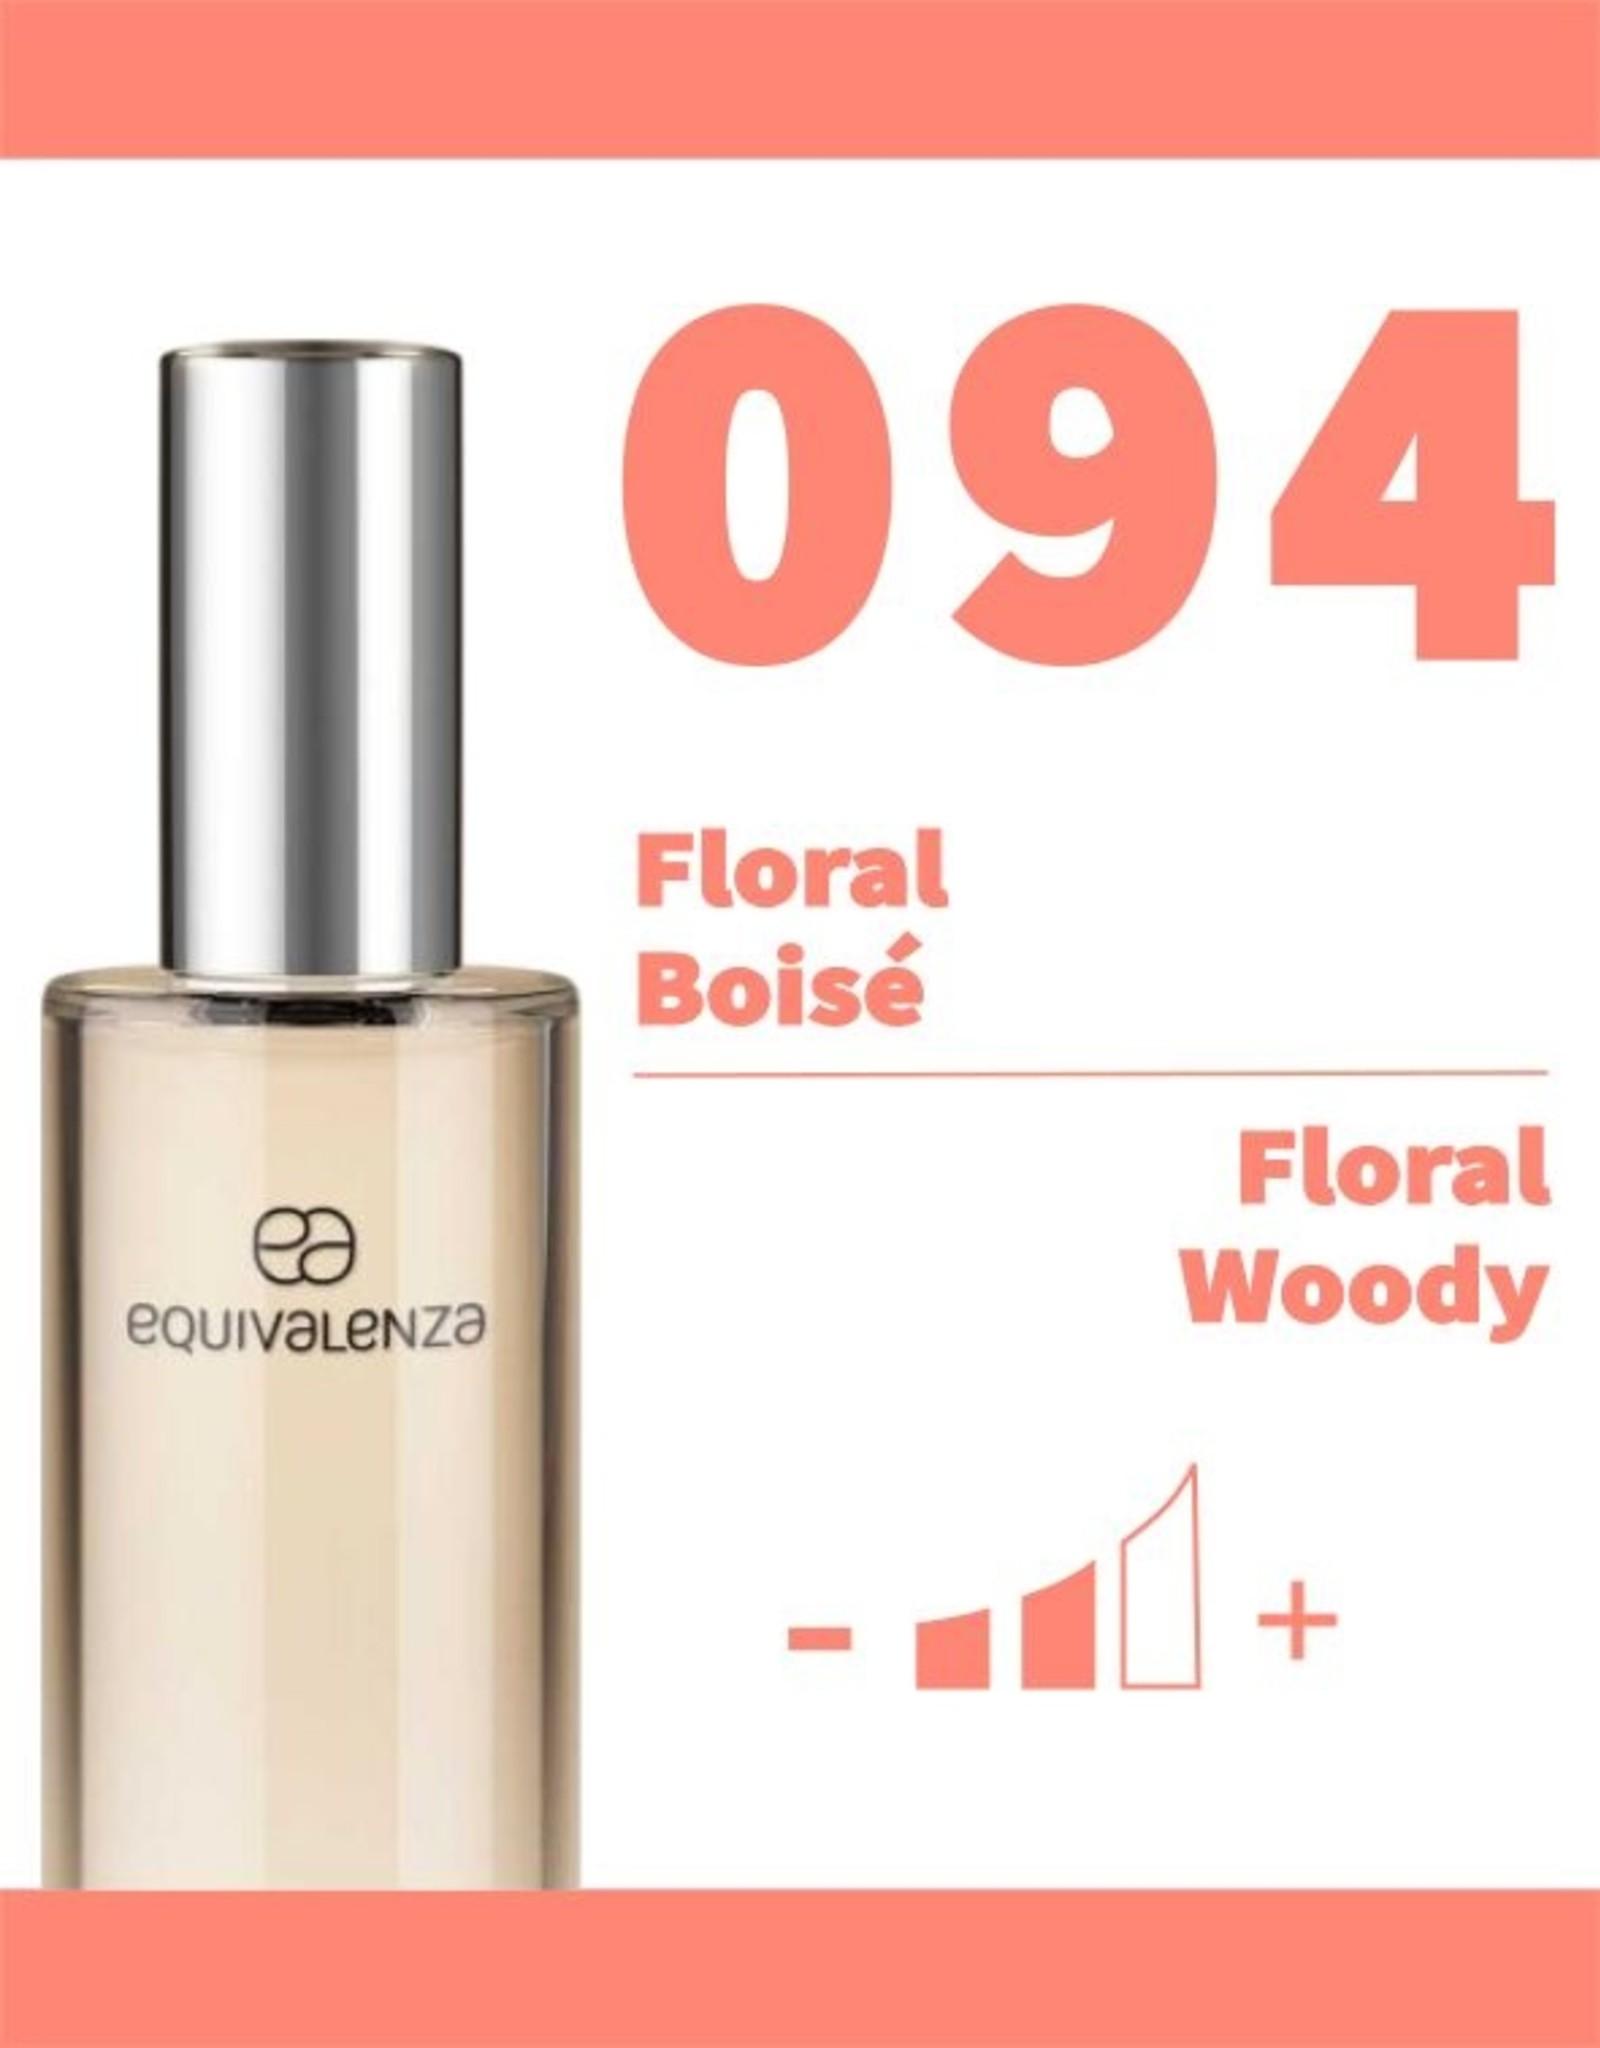 Equivalenza Eau de parfum Floral Woody 094